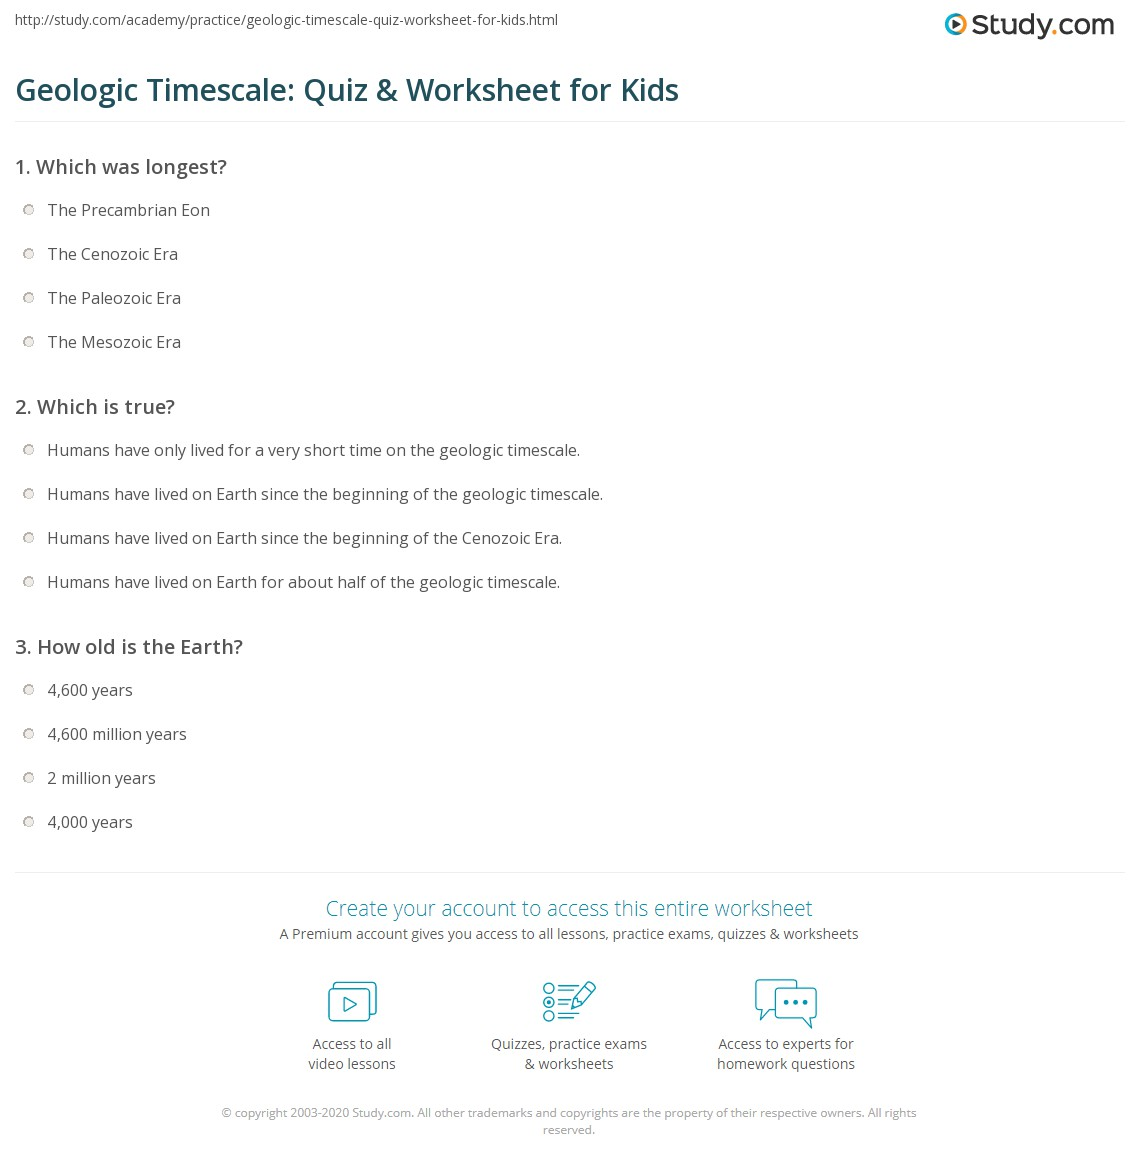 Geologic Timescale Quiz Worksheet For Kids Study Com